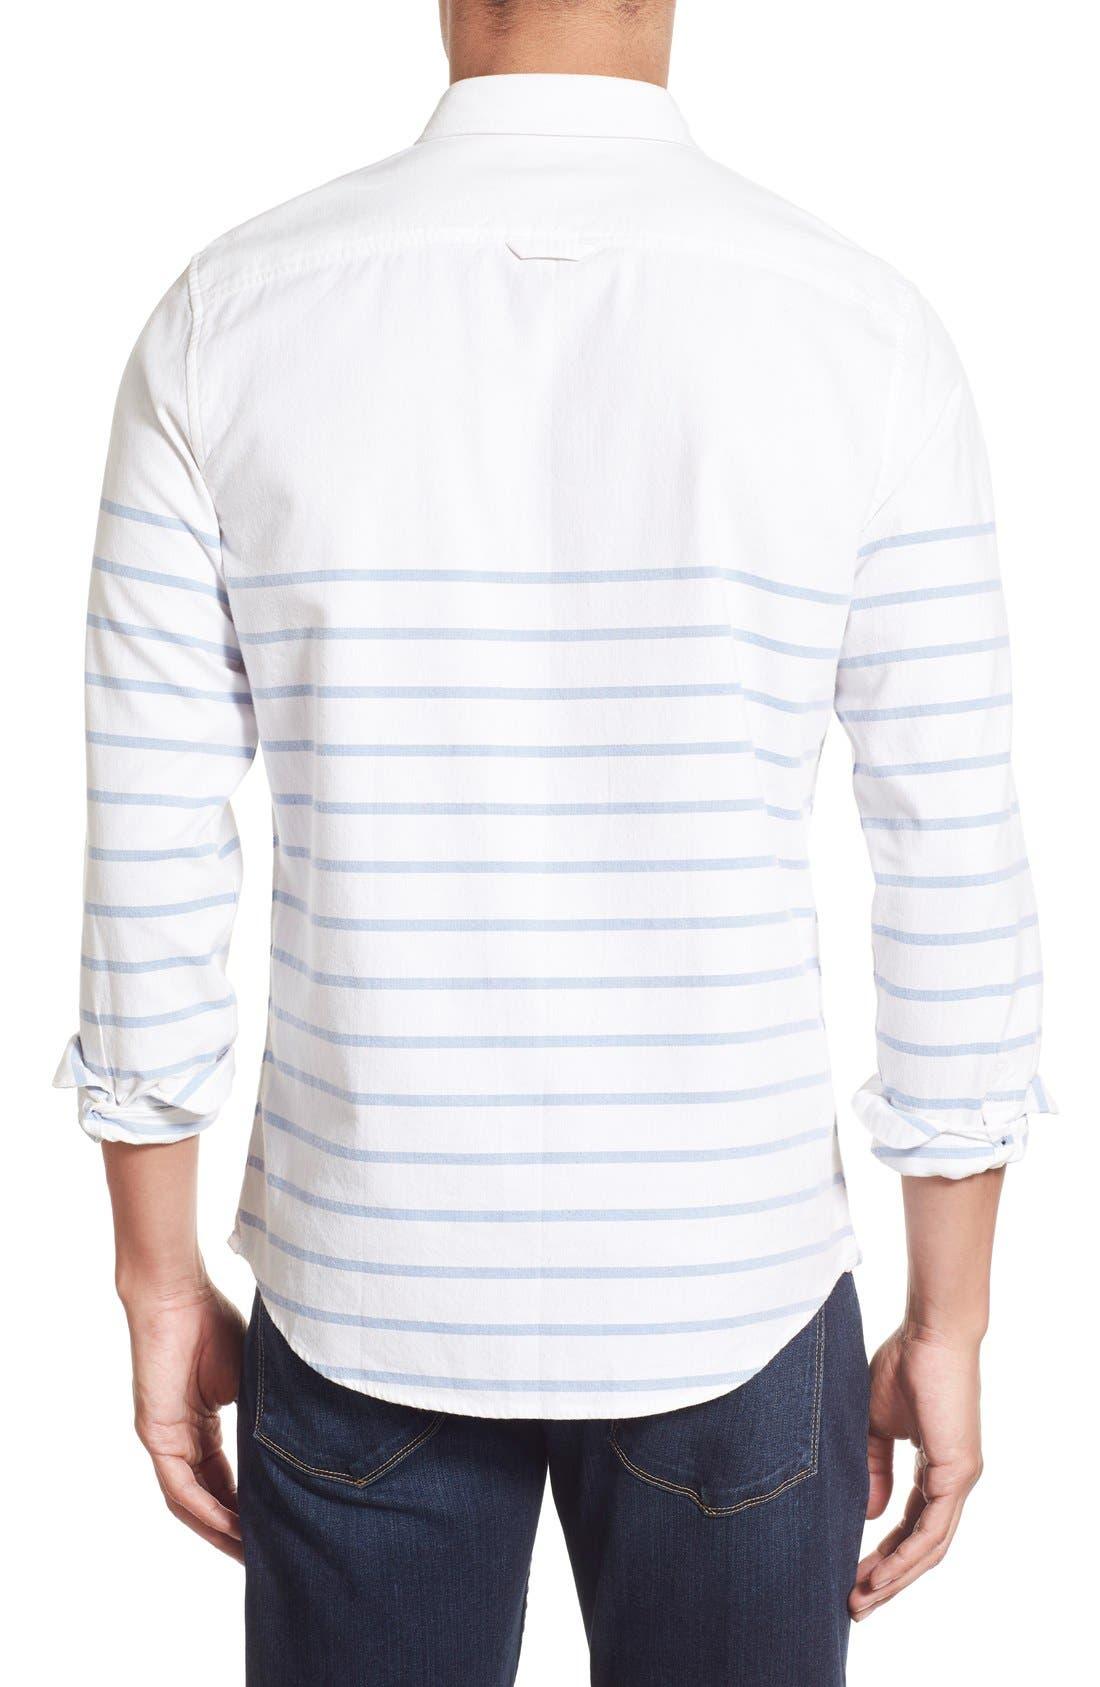 Alternate Image 2  - 1901 'La Conner' Trim Fit Stripe Print Woven Shirt